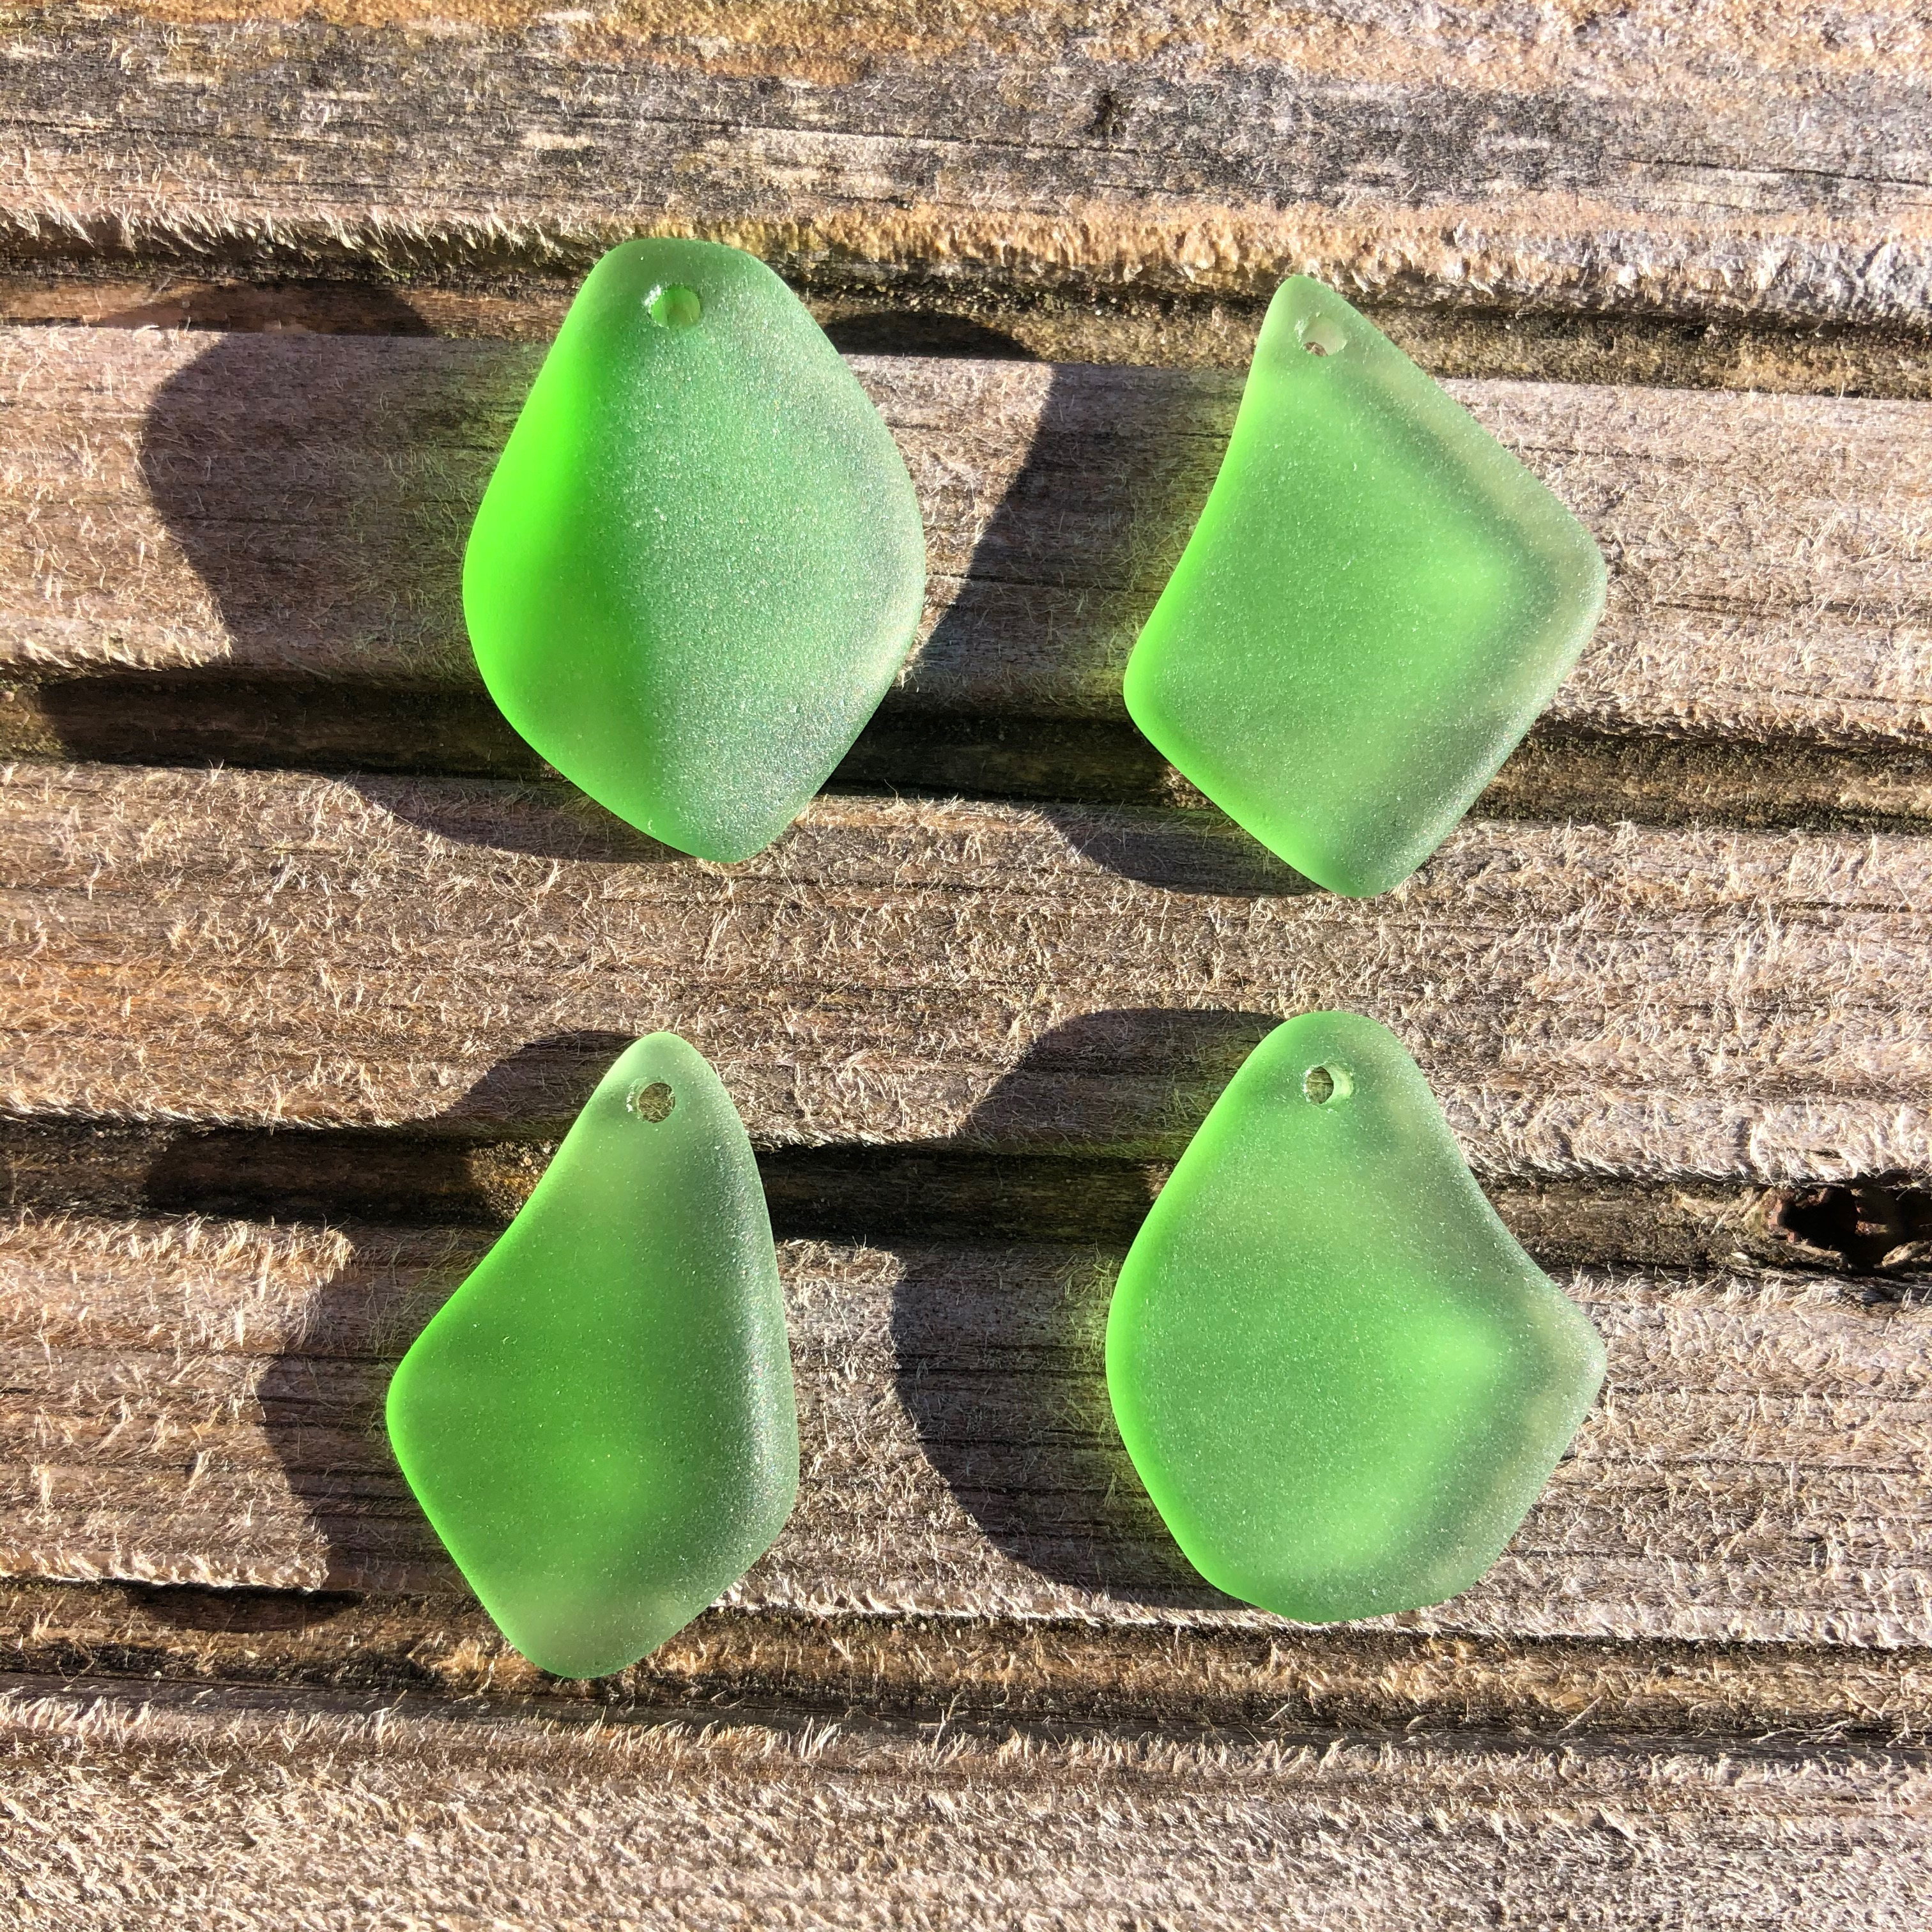 Cultured Sea Glass Freeform Pendants 08 Shamrock Green